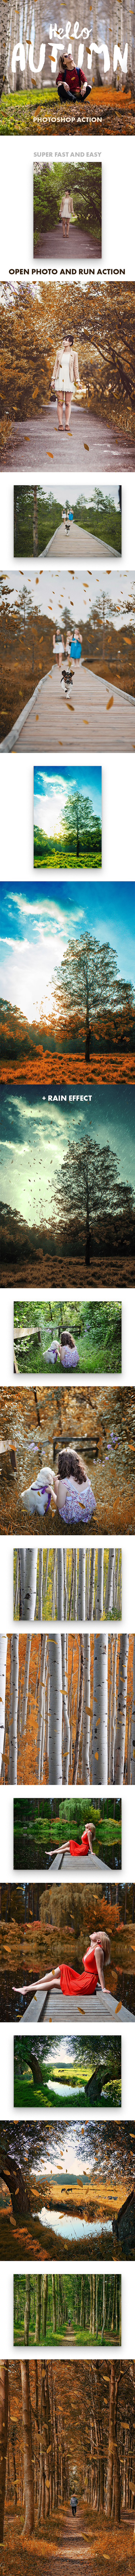 GraphicRiver Hello Autumn Photoshop Action 20471264